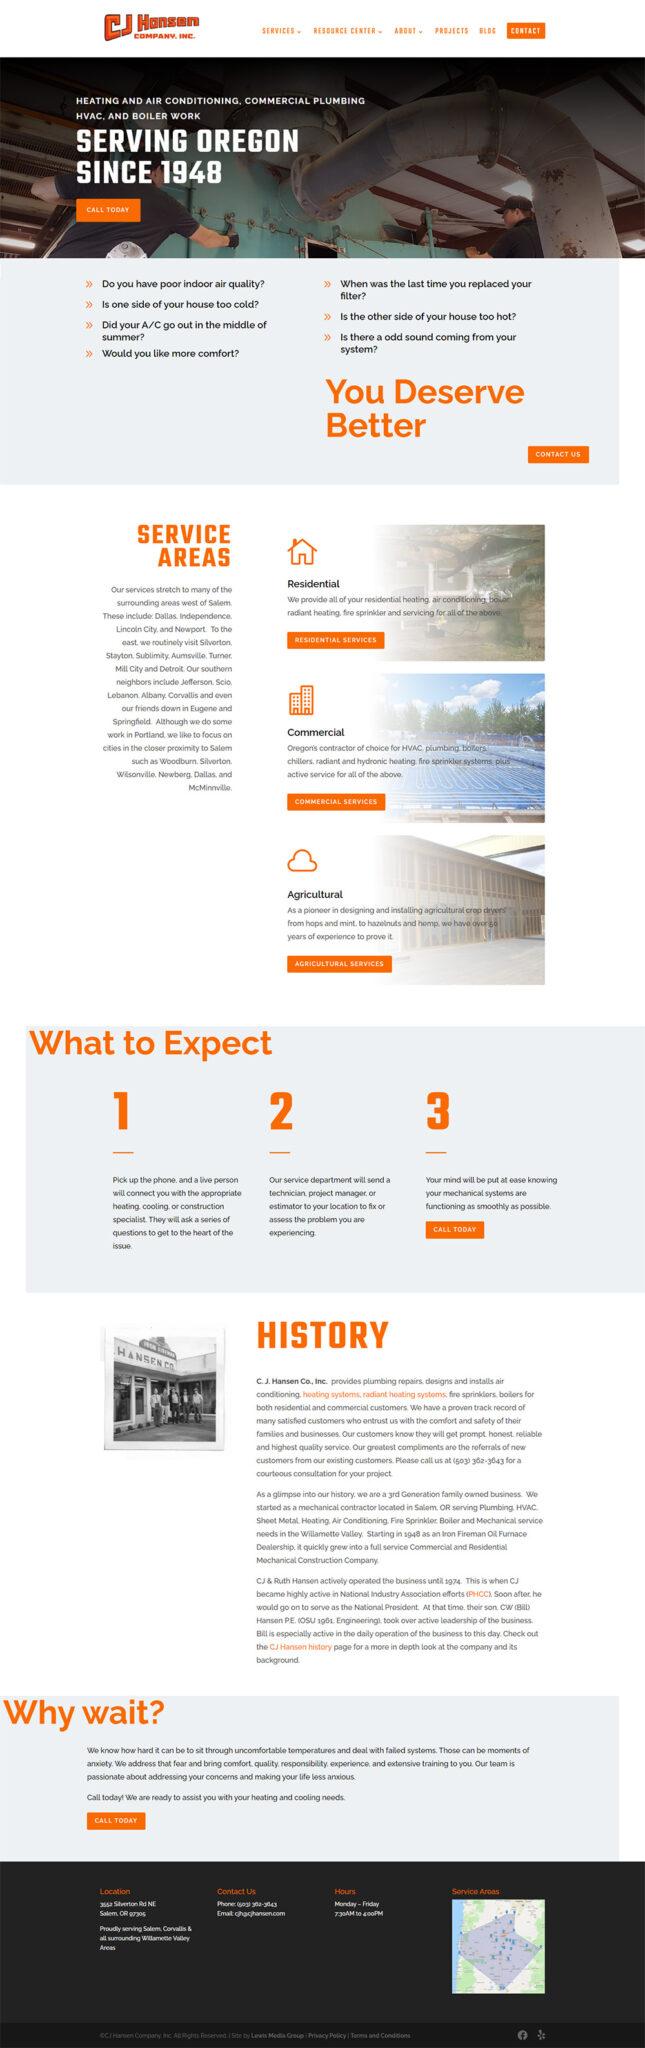 CJ Hansen Home page after redesign